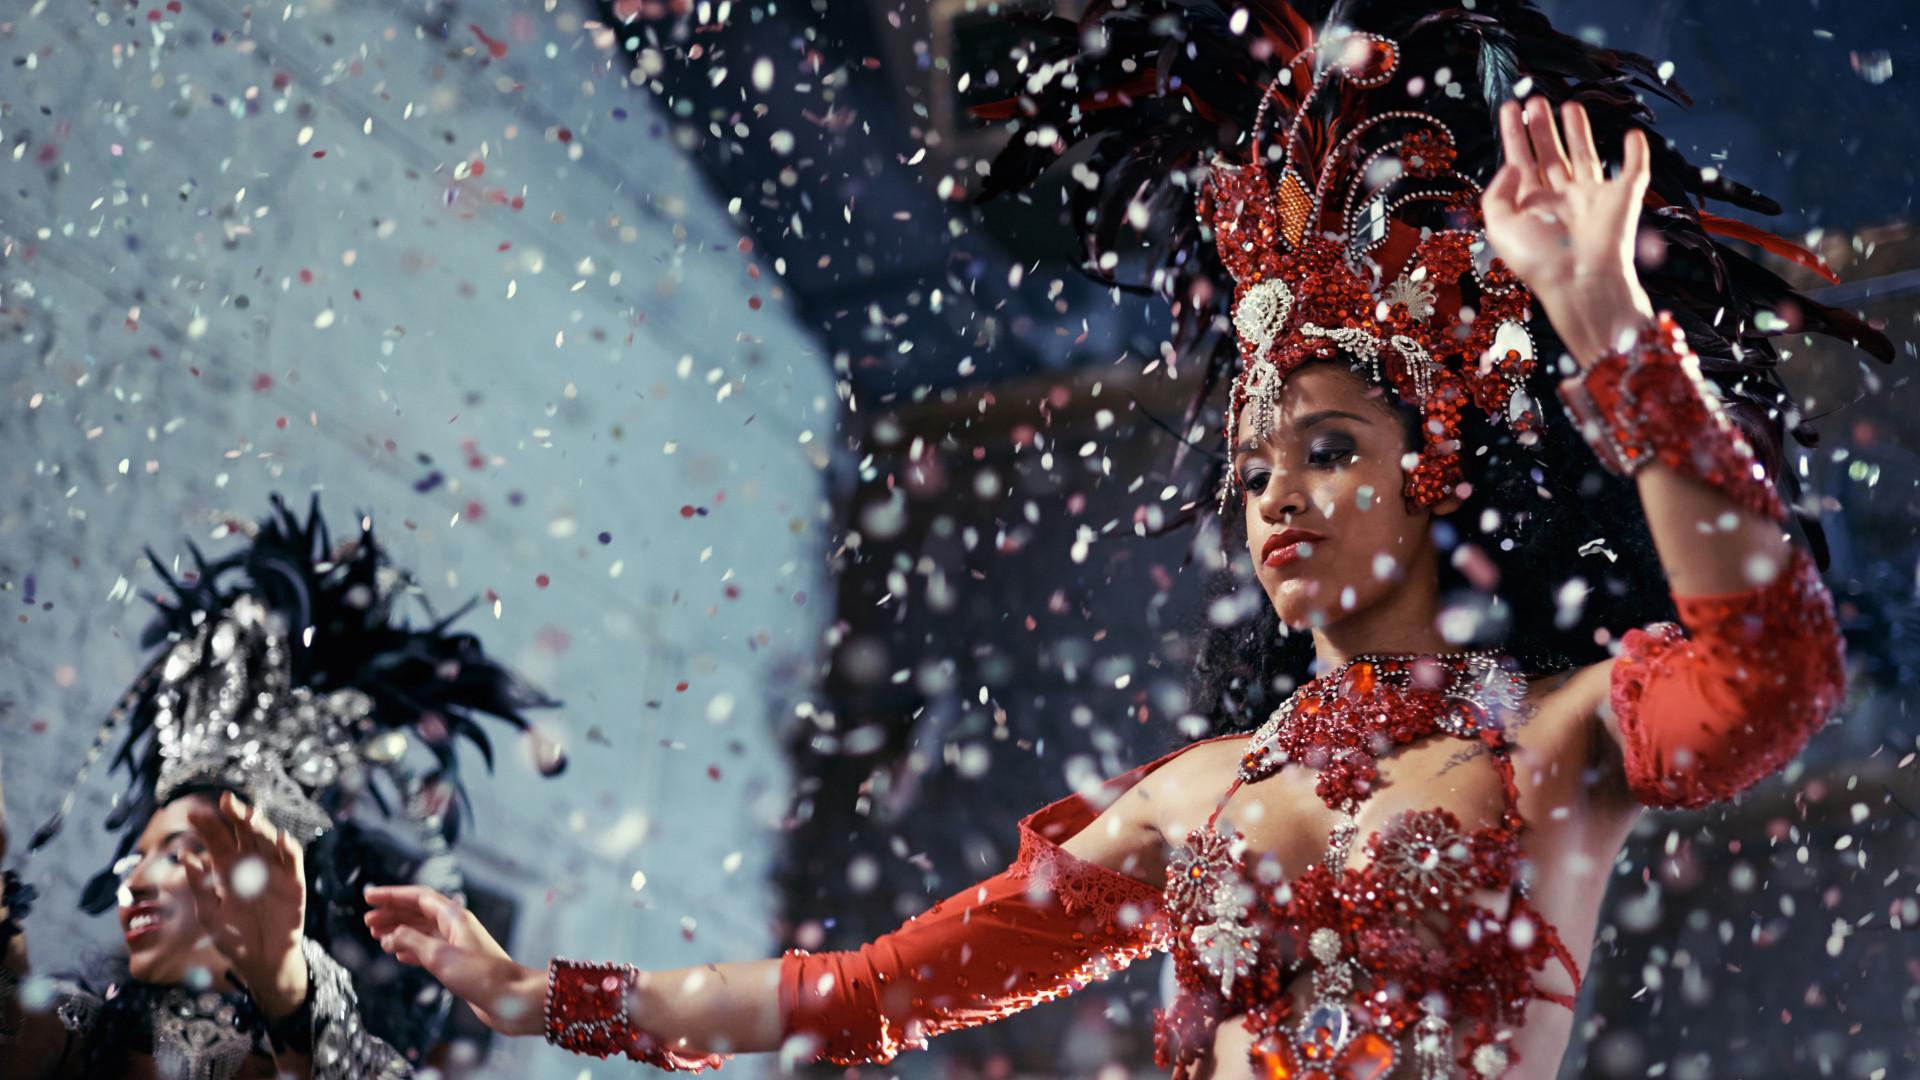 Pode o desfile de Carnaval ser considerado exercício físico?